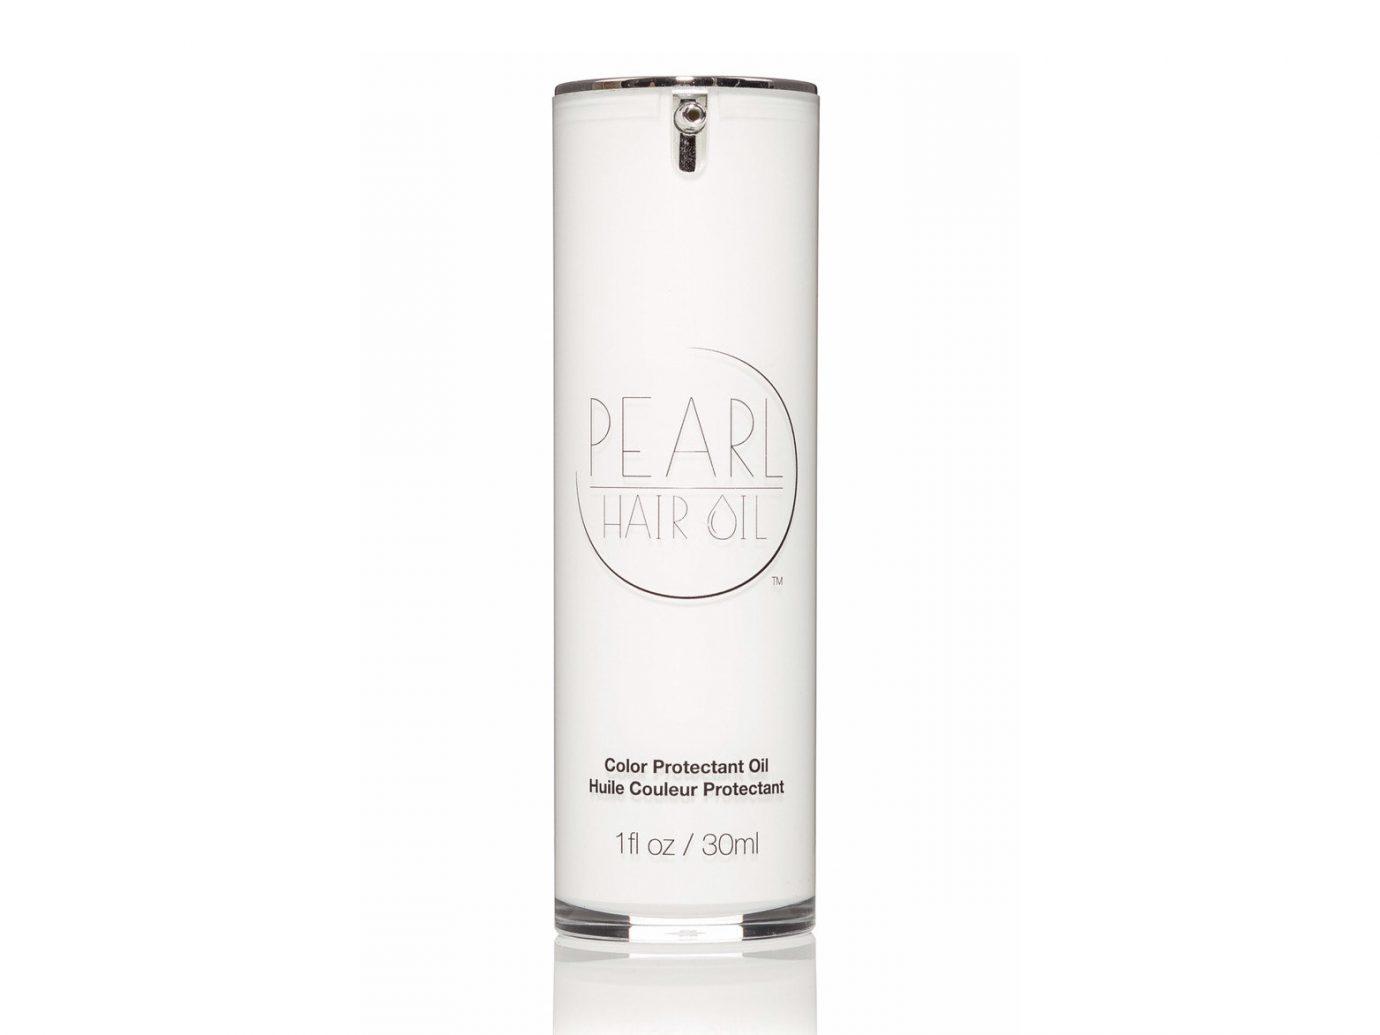 Beauty Health + Wellness Travel Shop product lotion skin care liquid perfume health & beauty